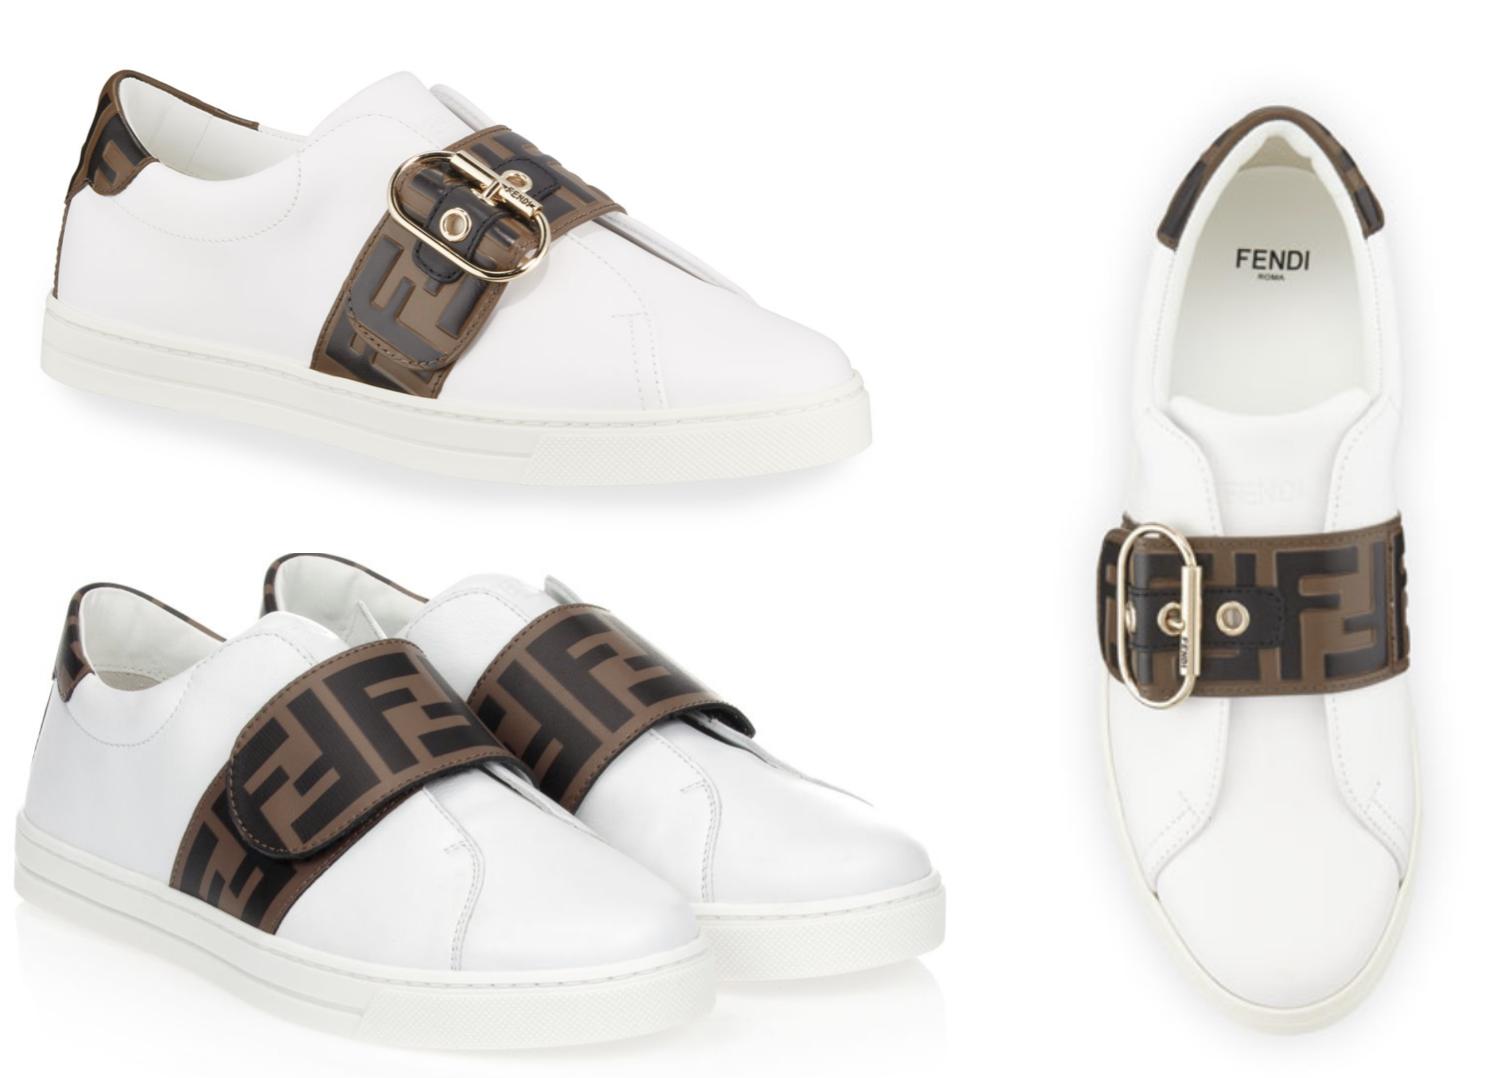 Fendi-sneakers-球鞋